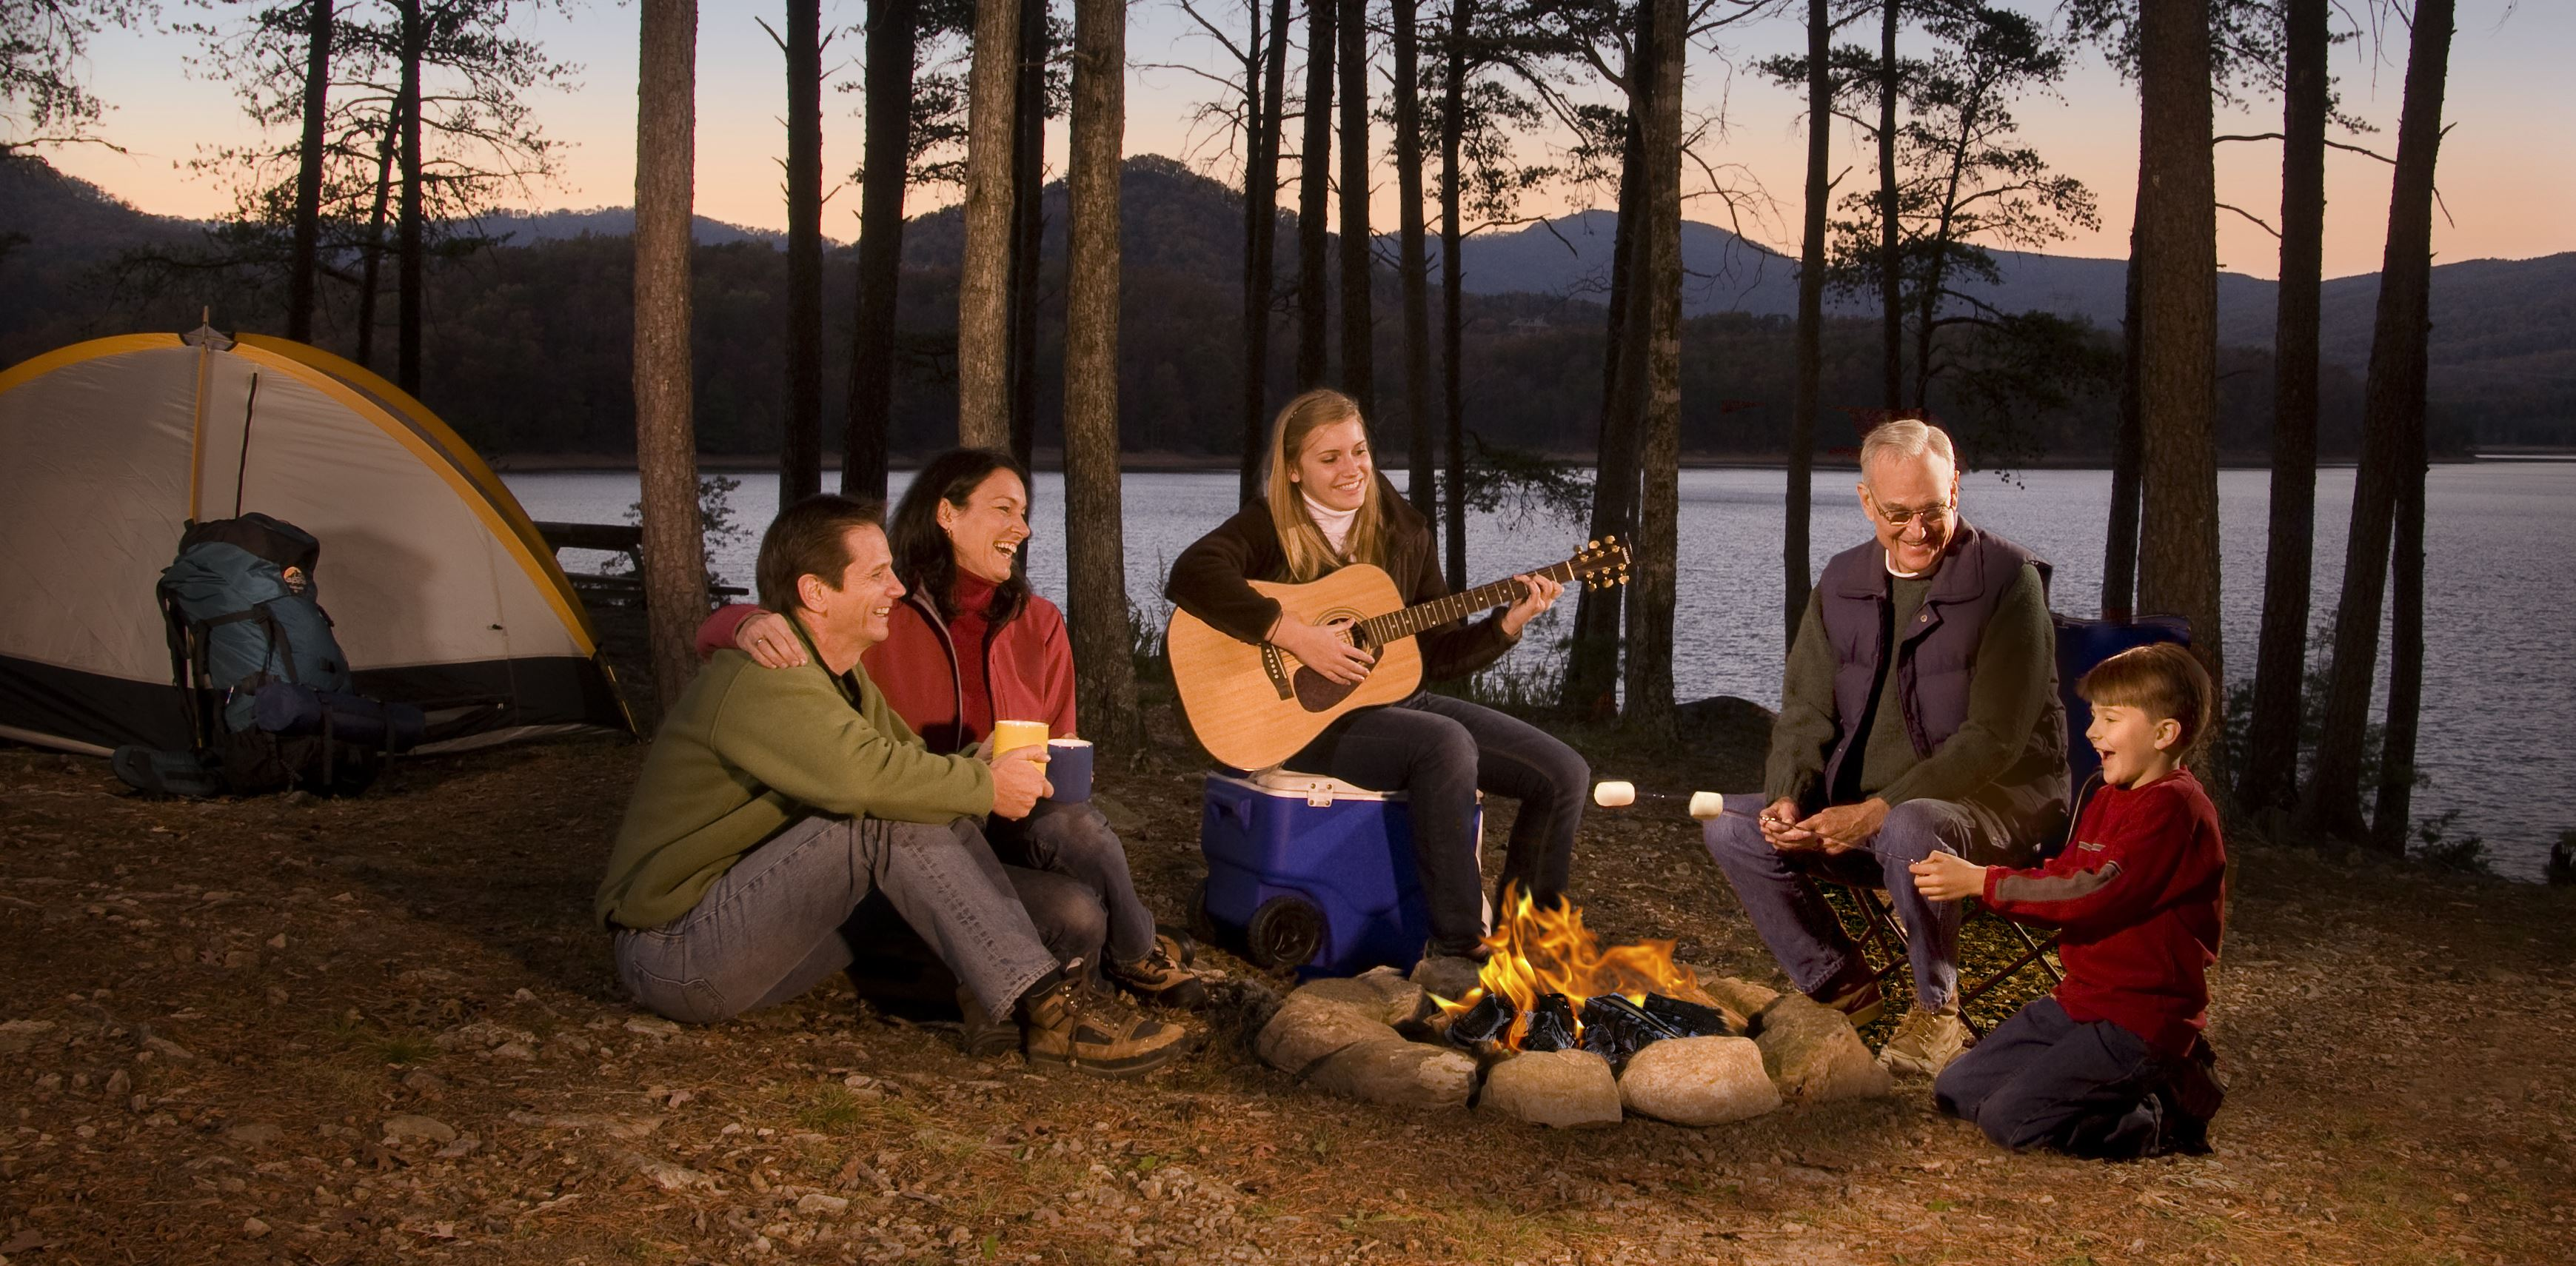 fun and camping